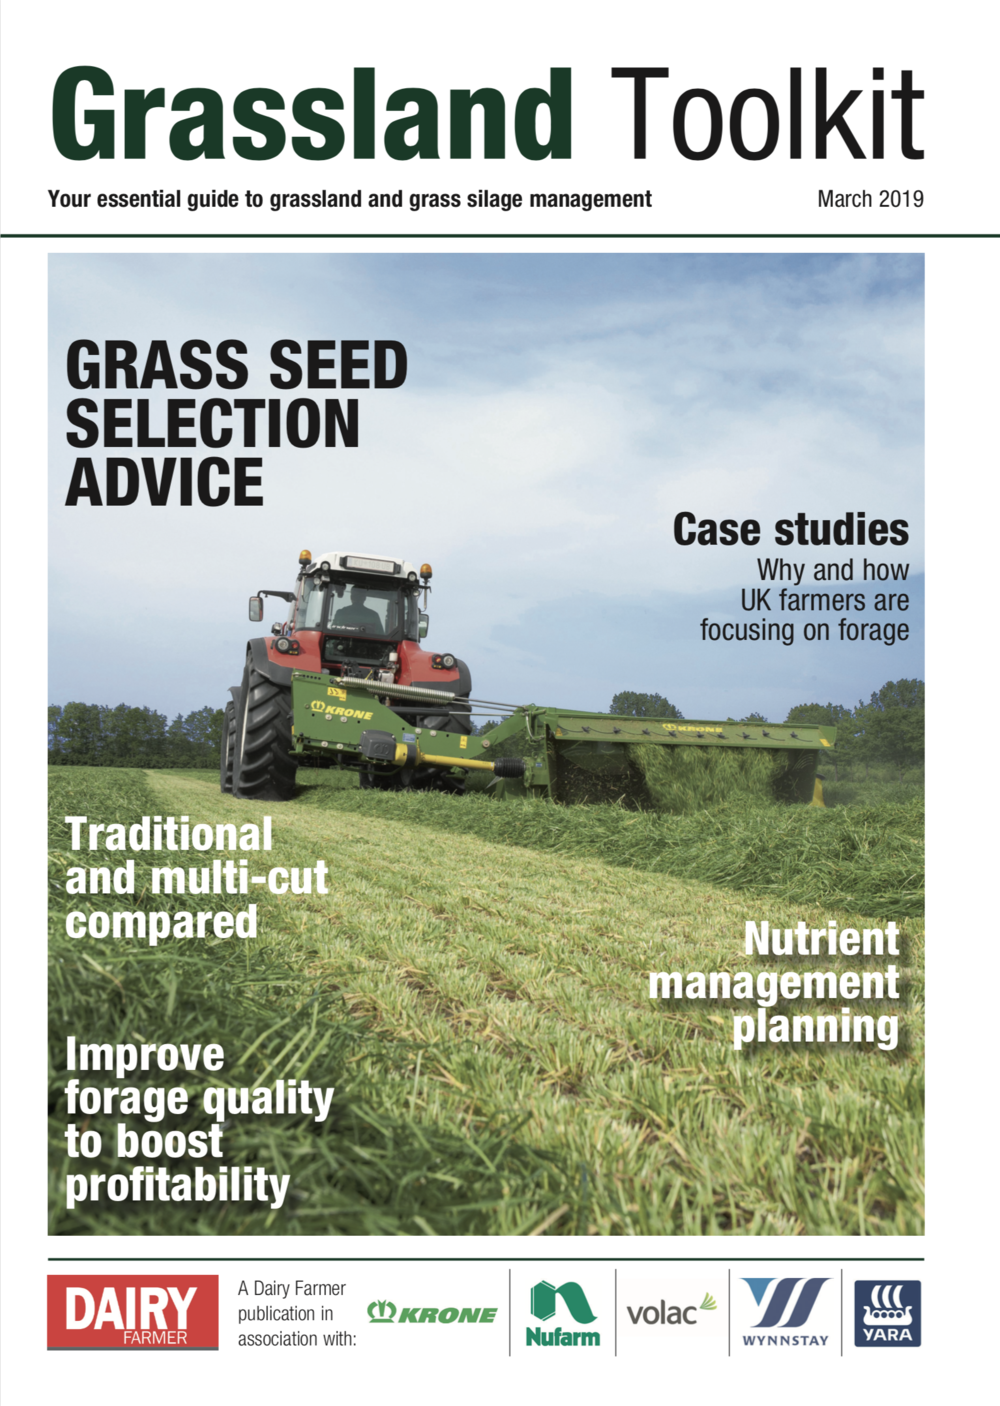 Grassland-toolkit-2019.png